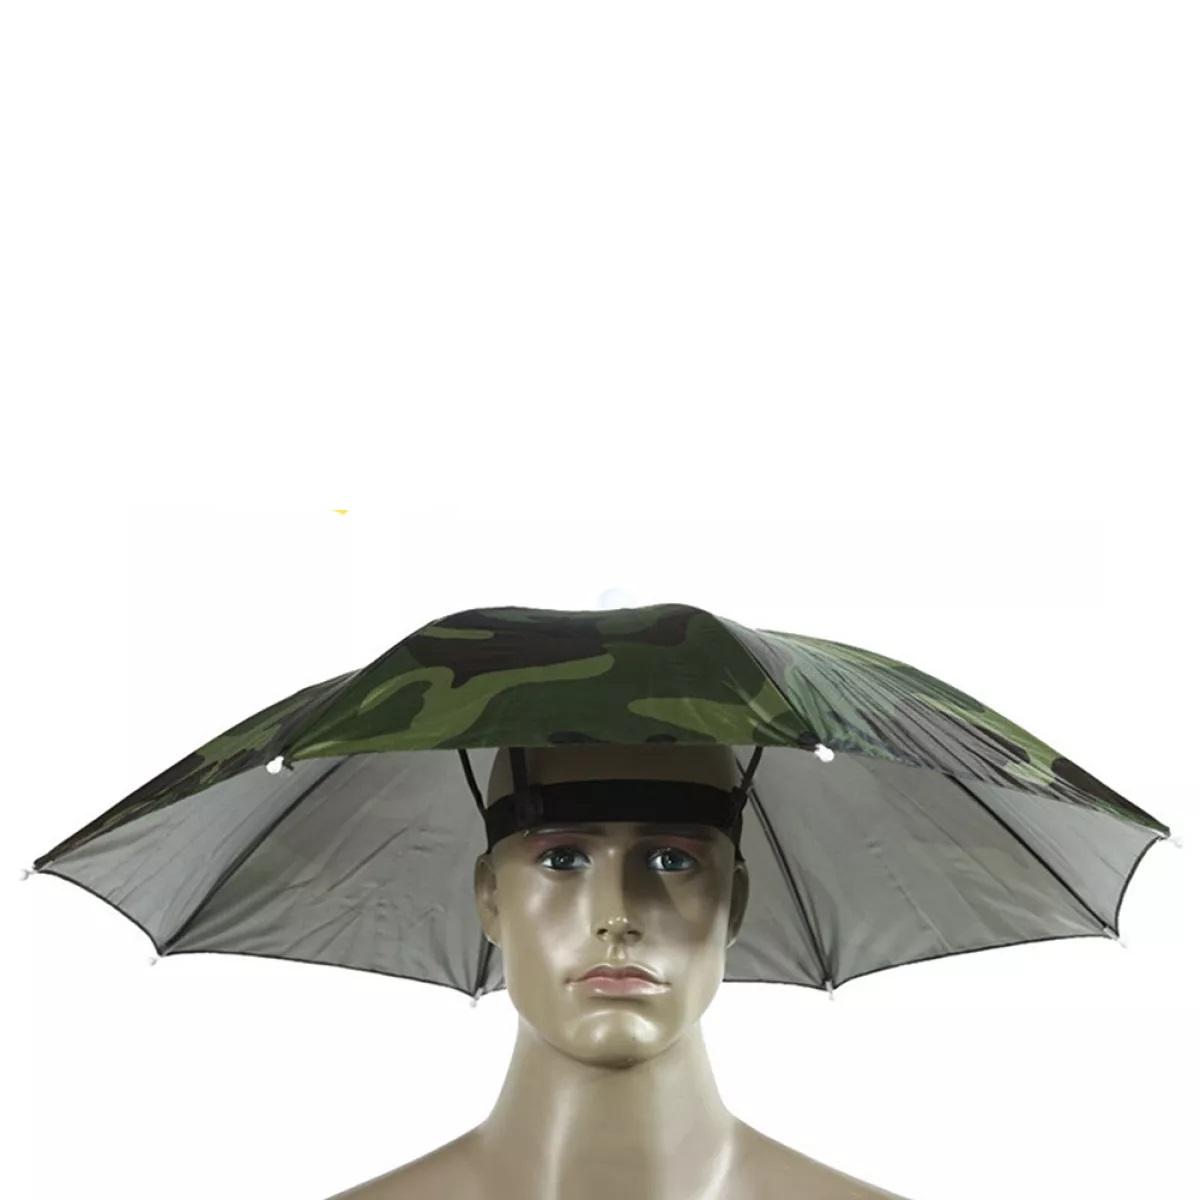 Regenschirm-Hut Kopfregenschirmhut kaufen